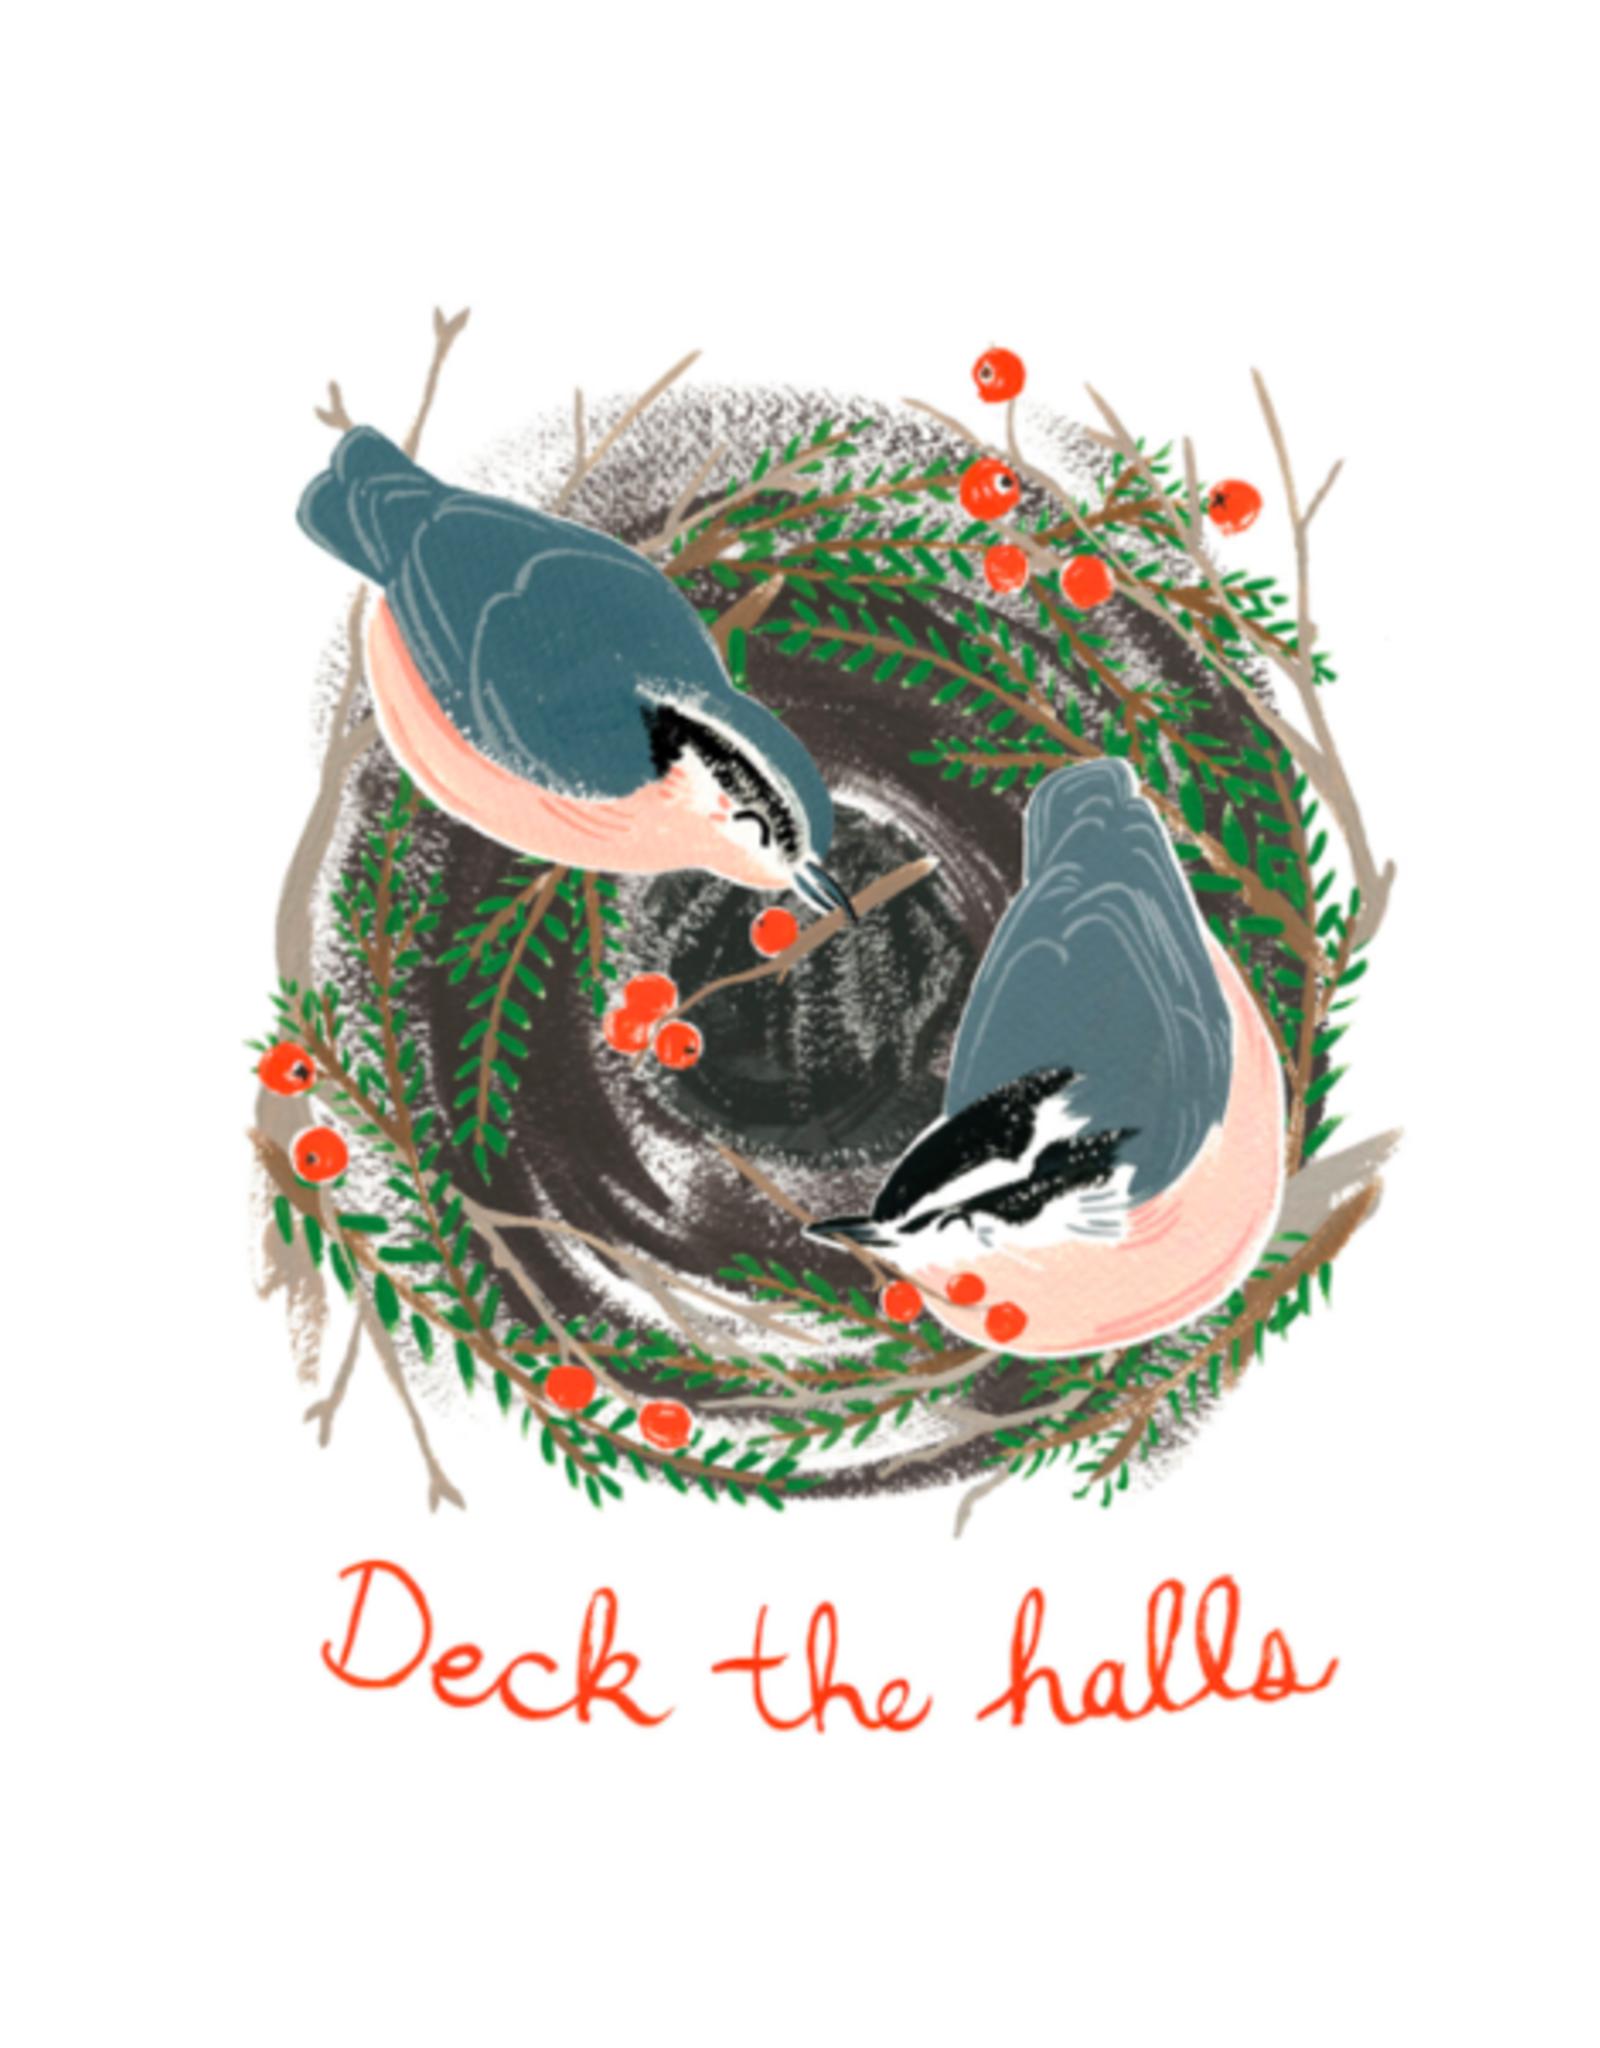 Kat Frick Miller - Card/Deck The Halls Nuthatches